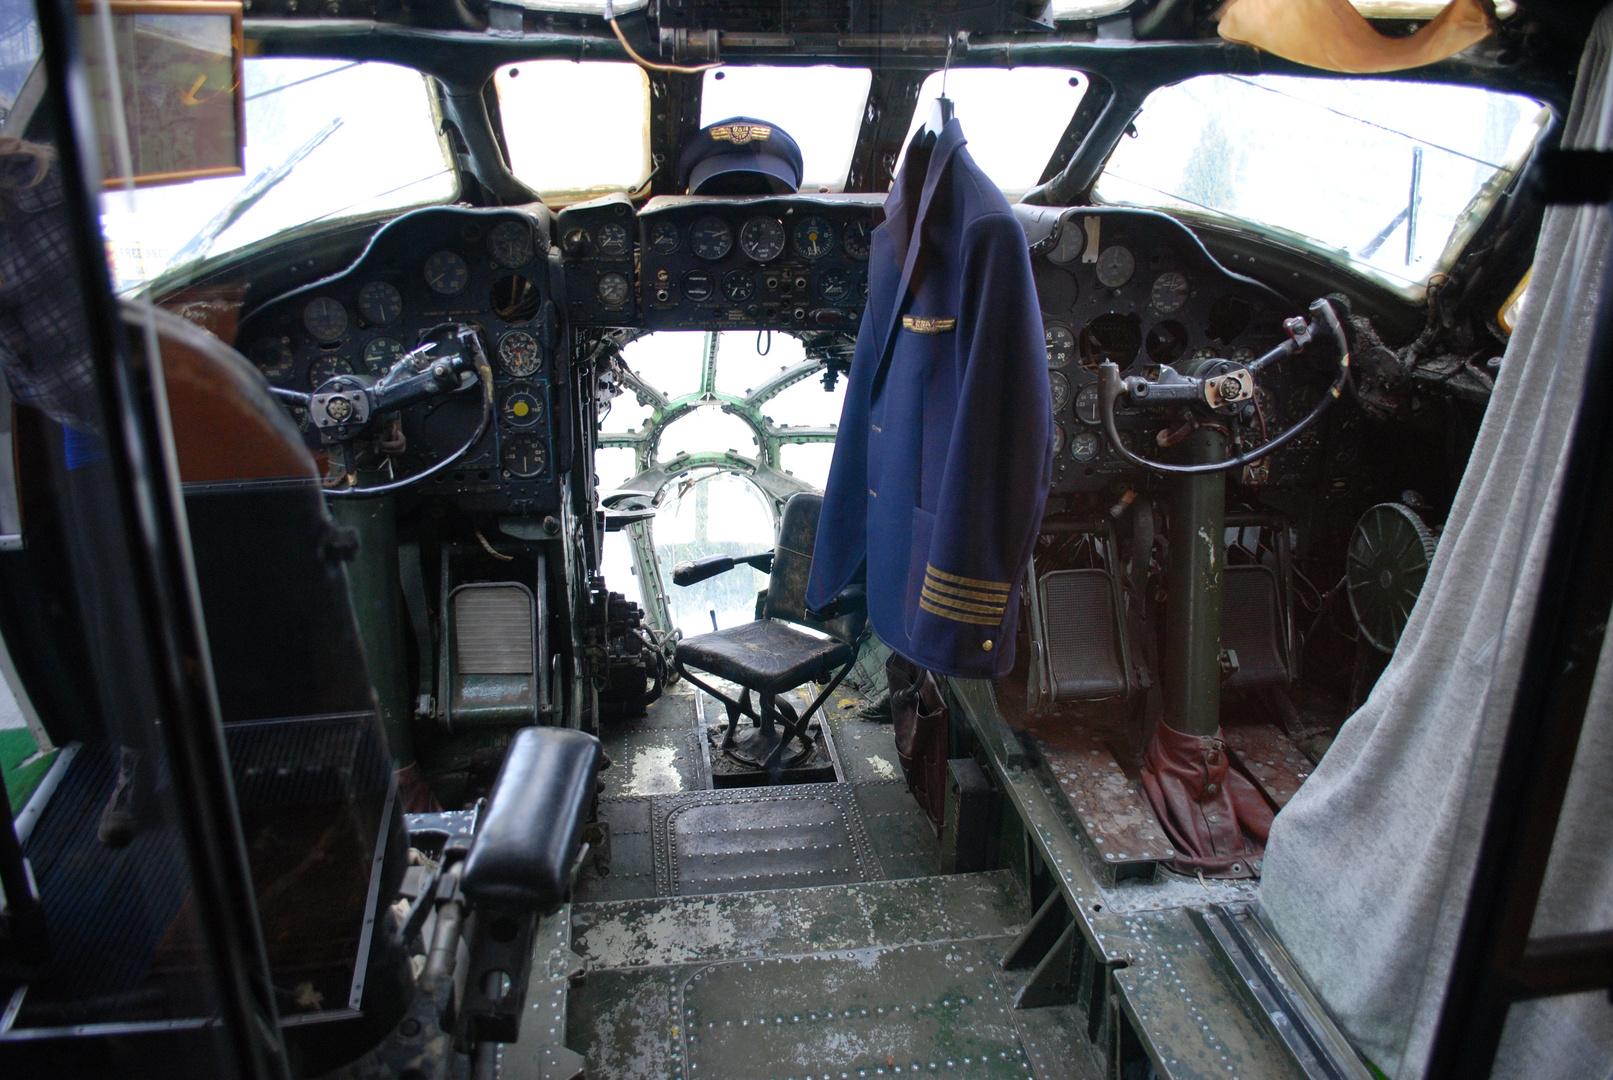 TU 104